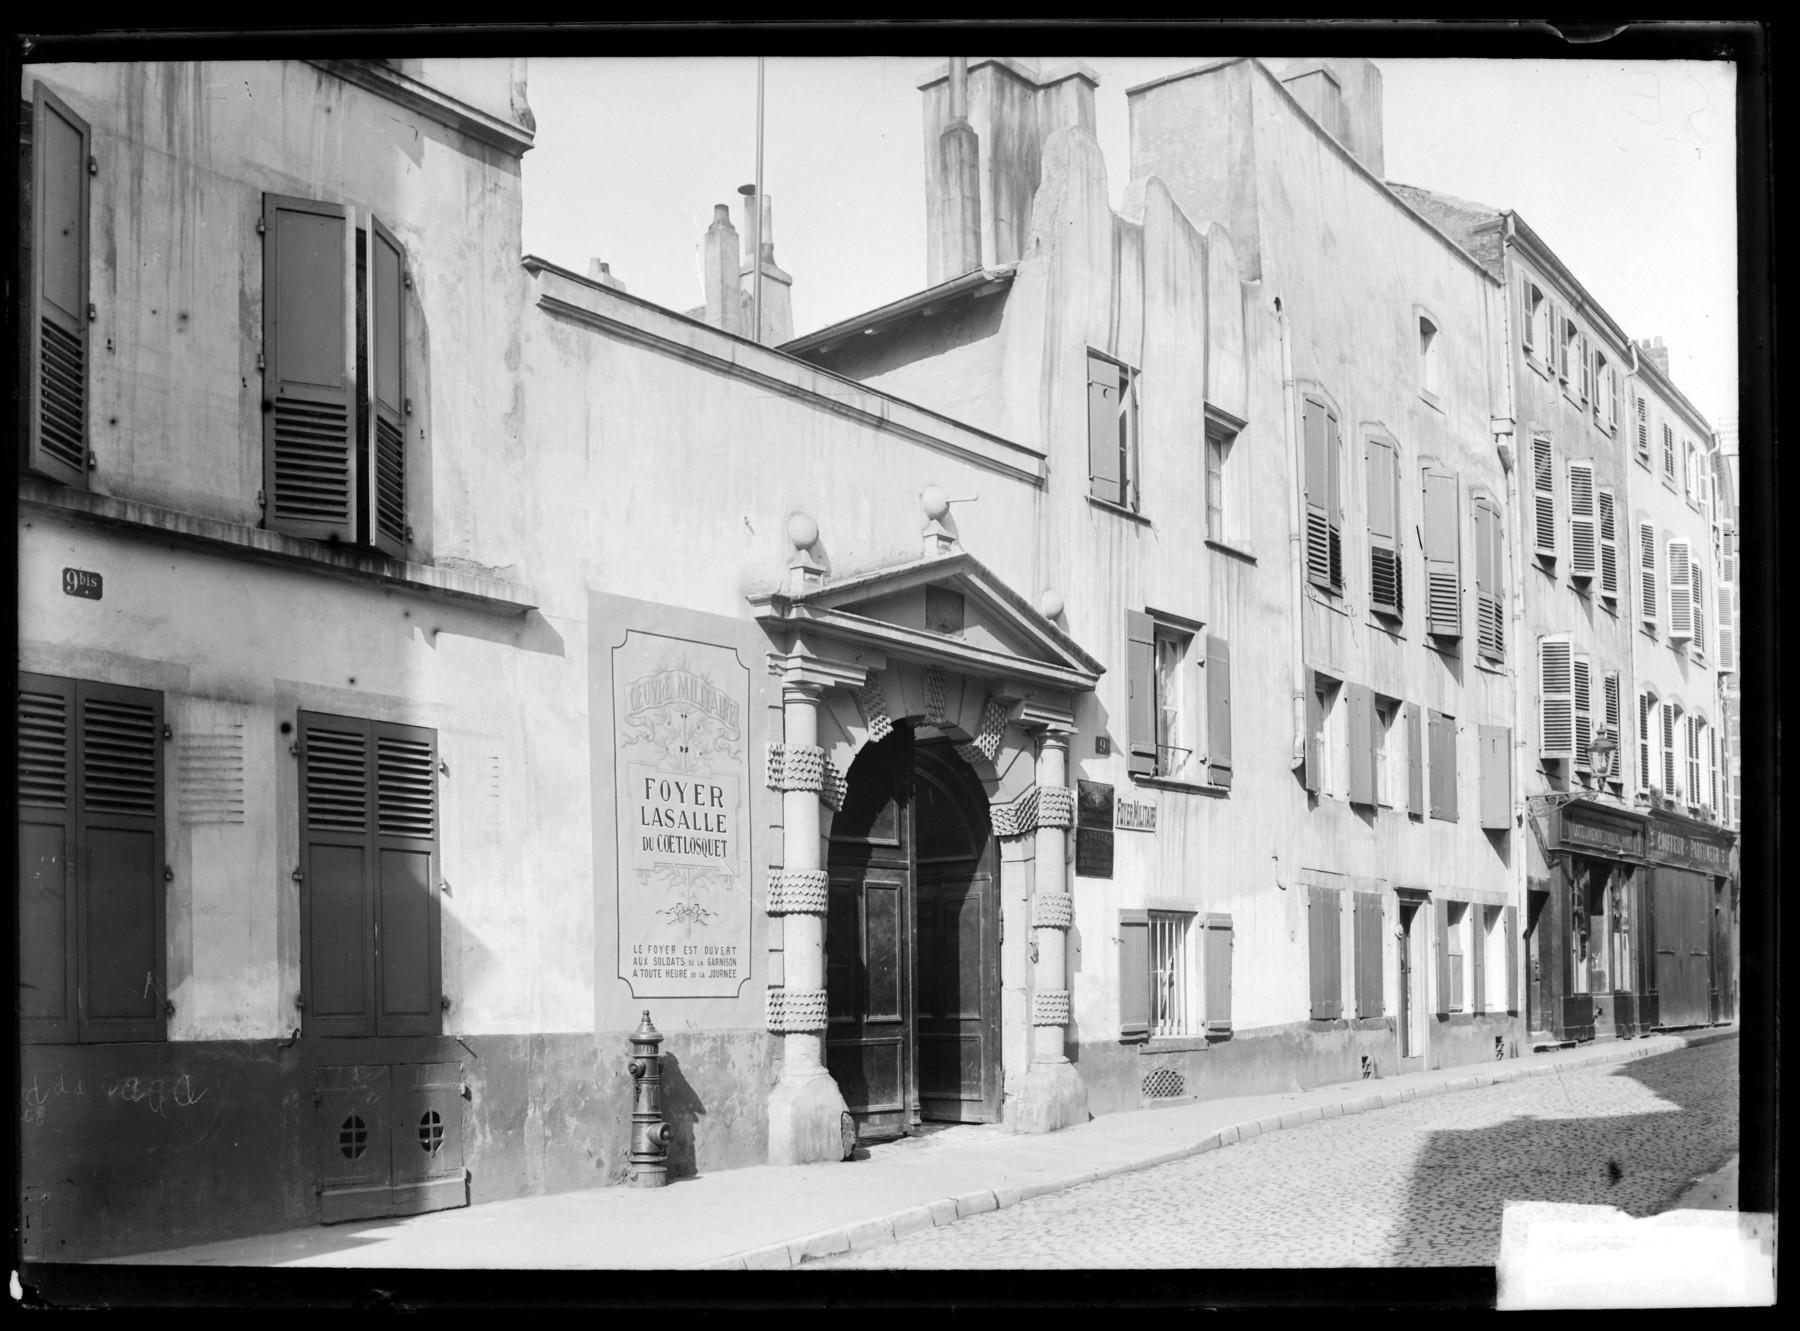 Contenu du Foyer Lasalle du Coëtlosquet